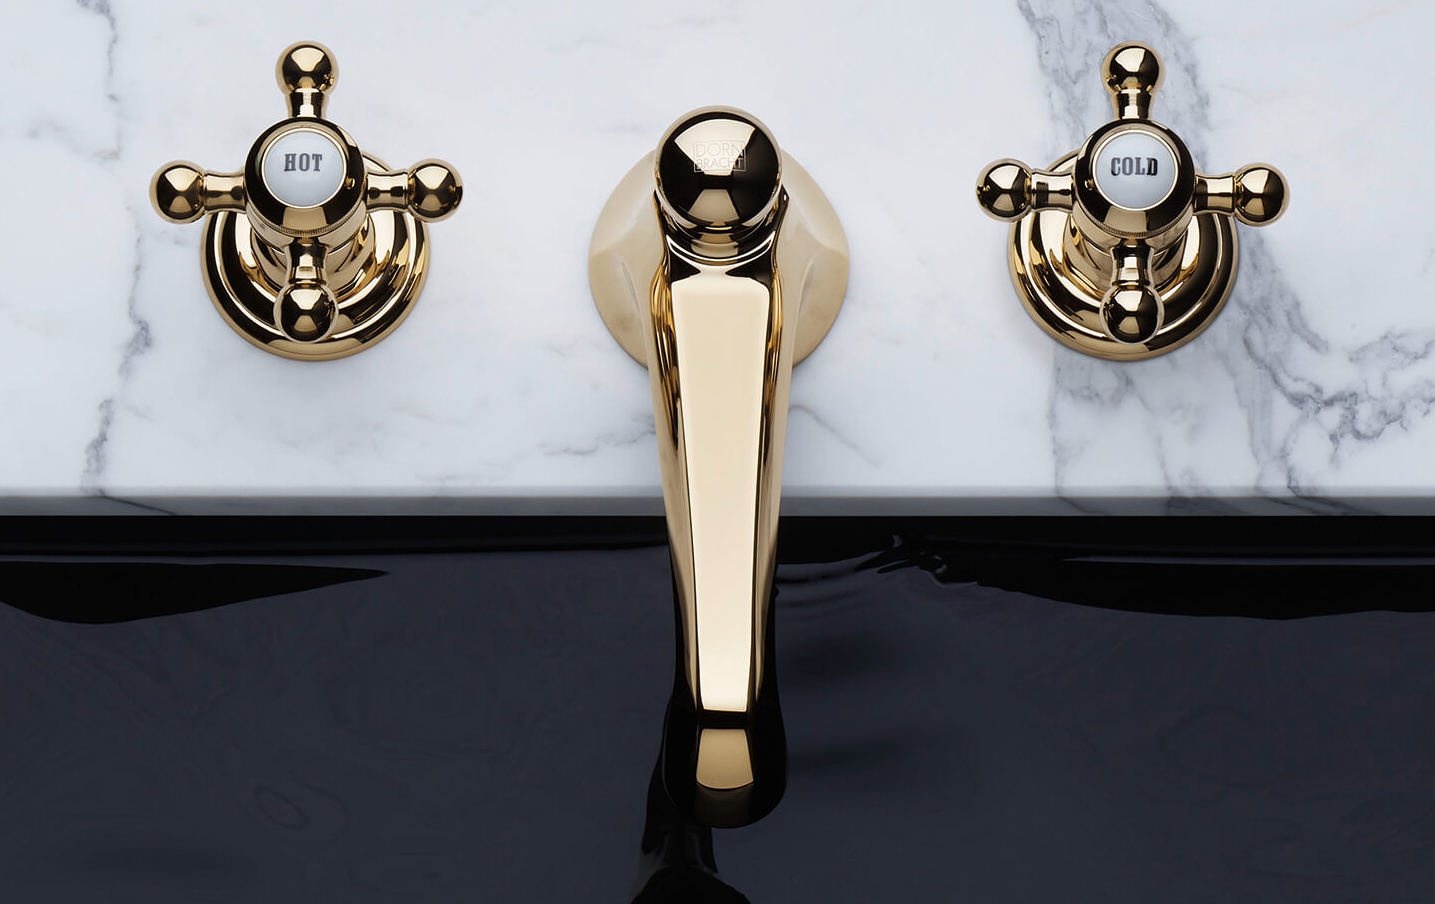 Grifería de alta gama Dornbracht modelo Madison